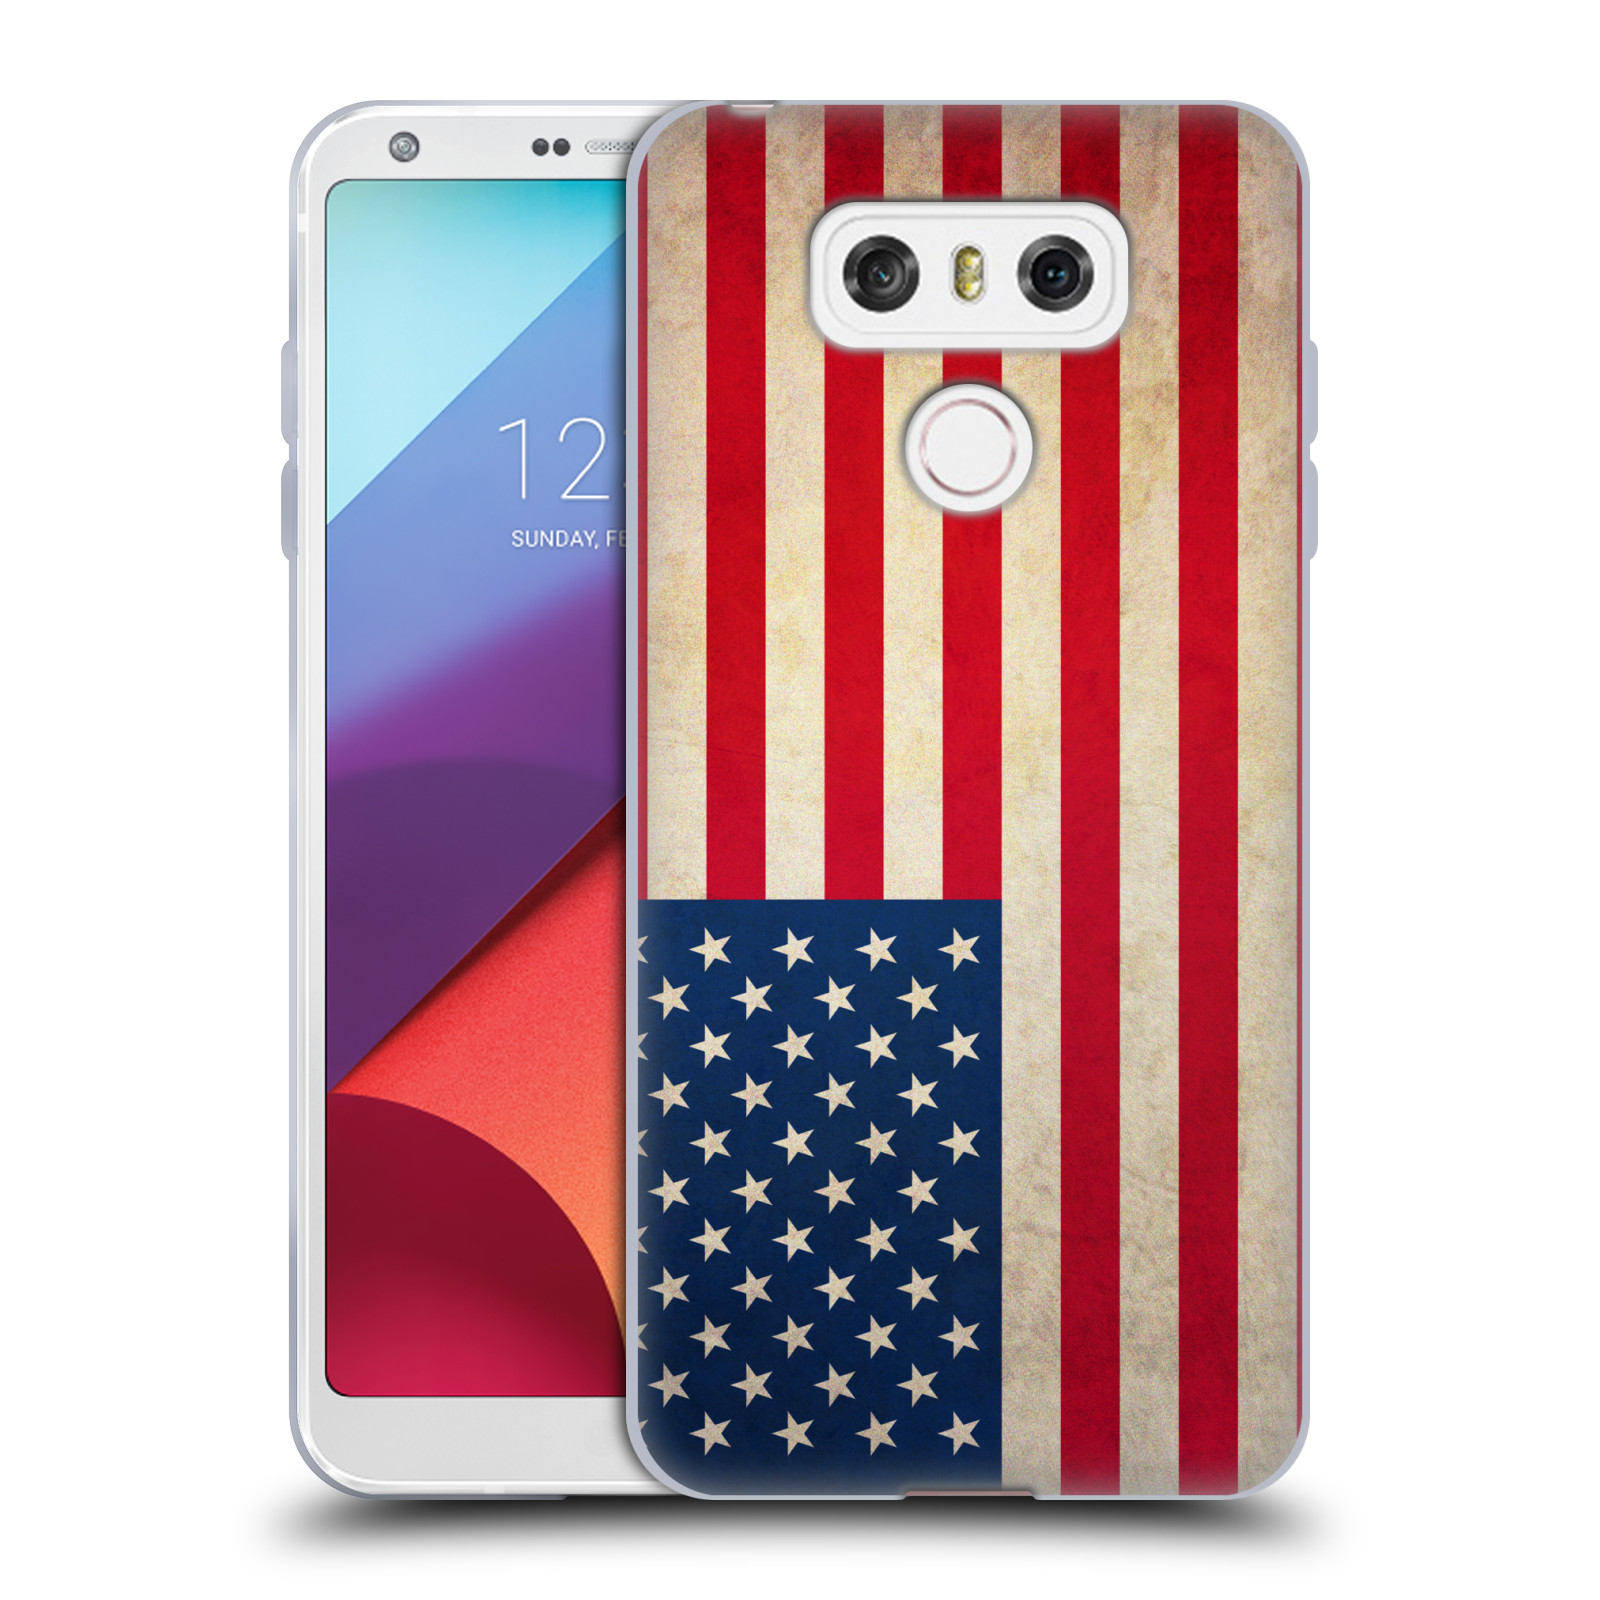 Silikonové pouzdro na mobil LG G6 - Head Case VLAJKA USA (Silikonový kryt či obal na mobilní telefon LG G6 H870 / LG G6 Dual SIM H870DS)